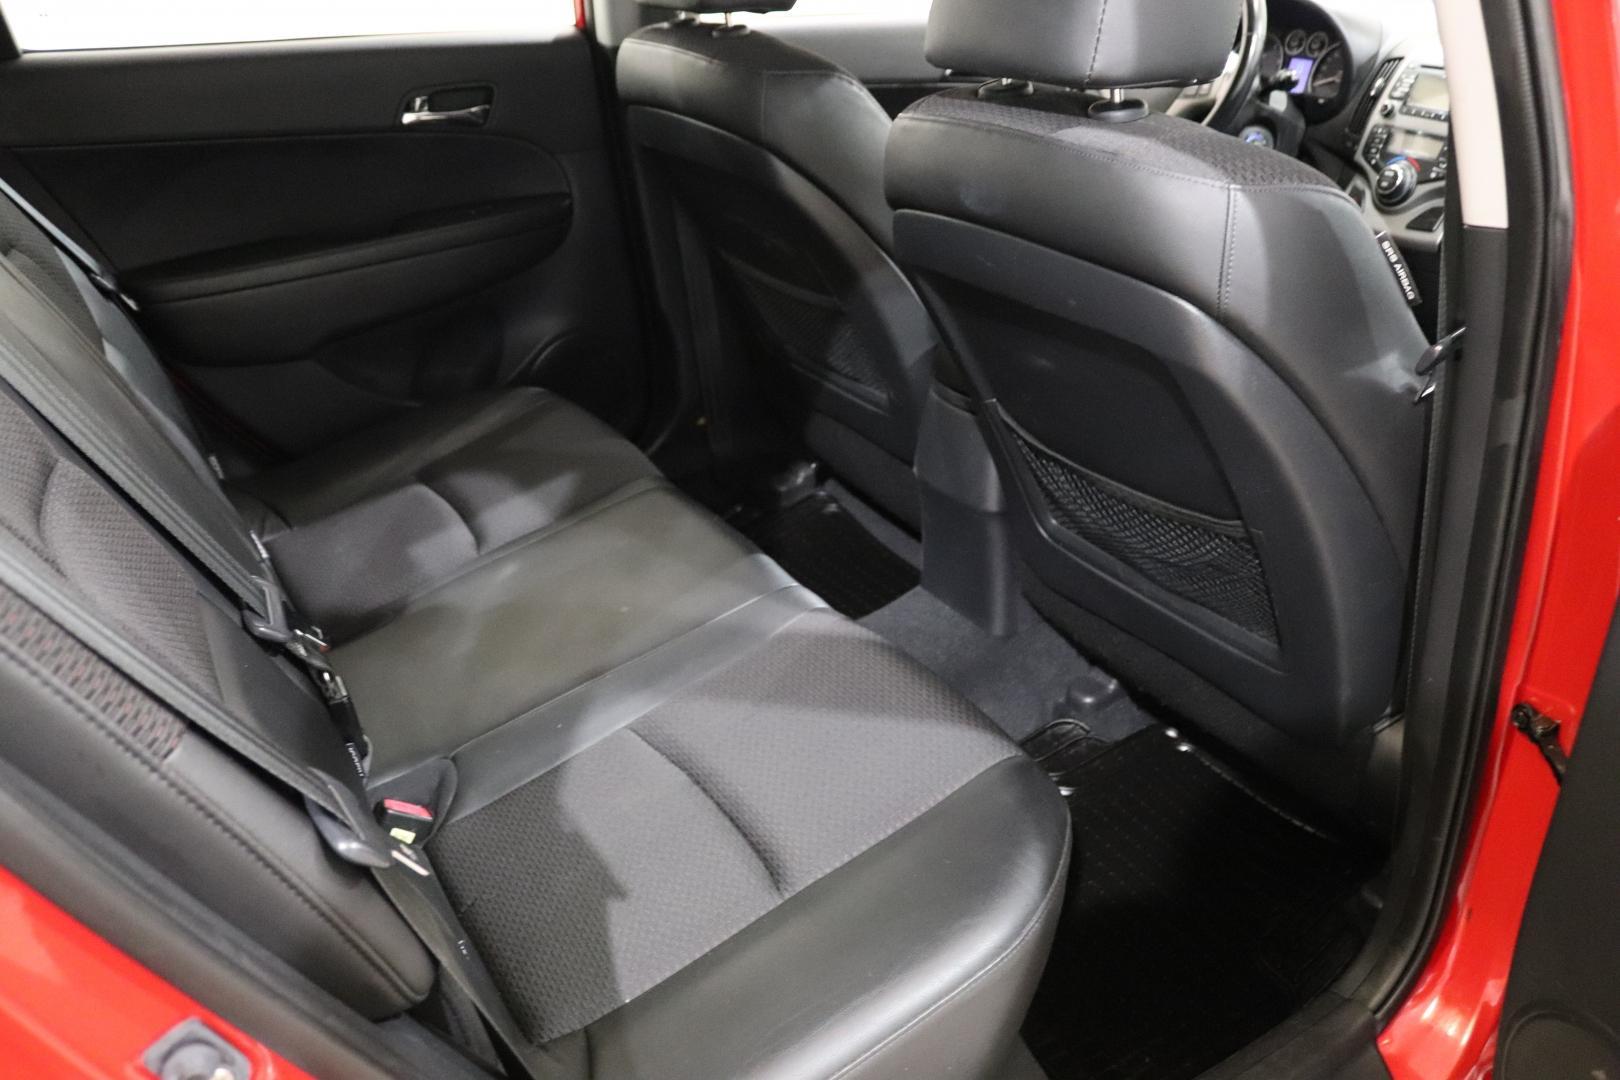 Hyundai i30, 2.0 CRDi Style Wagon